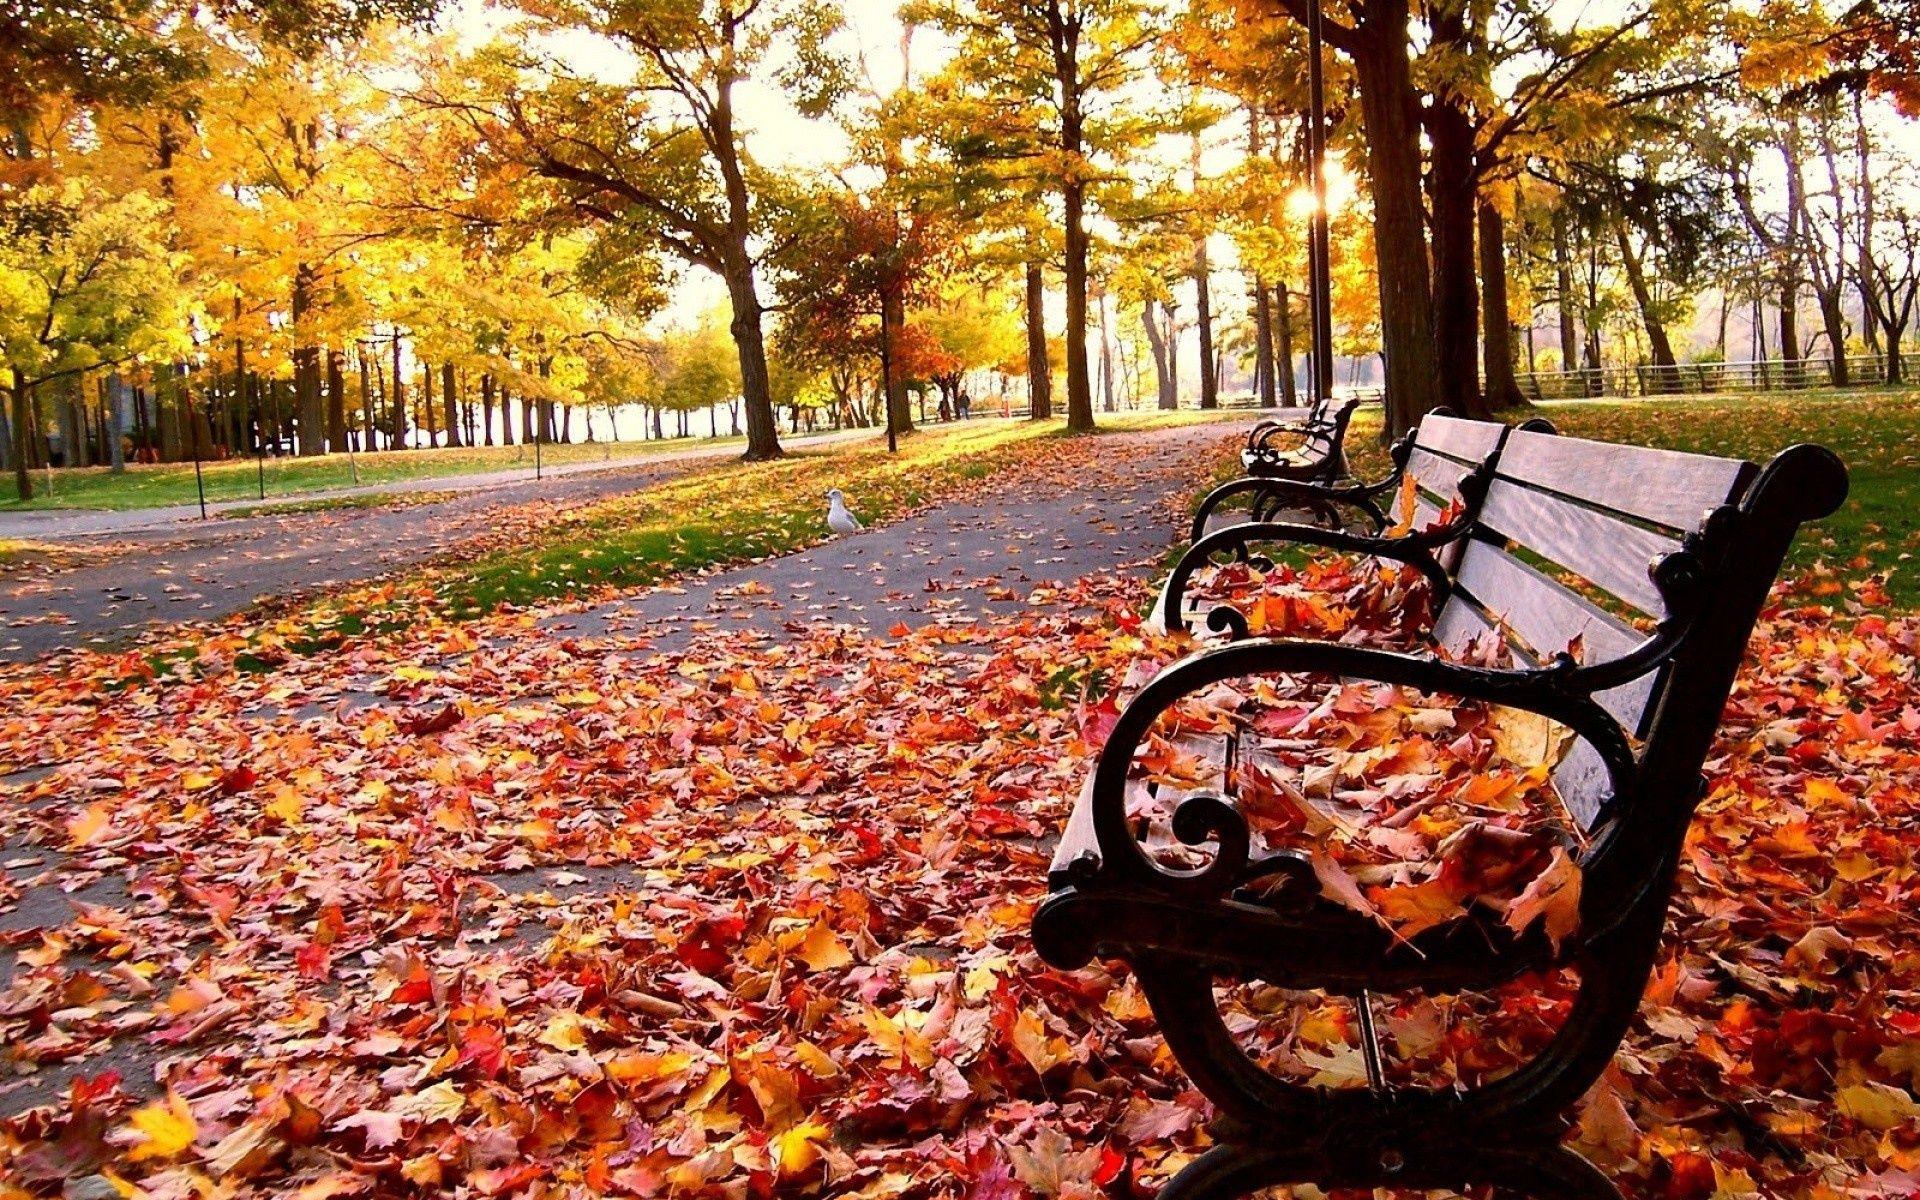 Autumn Tumblr Wallpaper Hd 1py 1920x1200 Px 1 12 Mb Nature